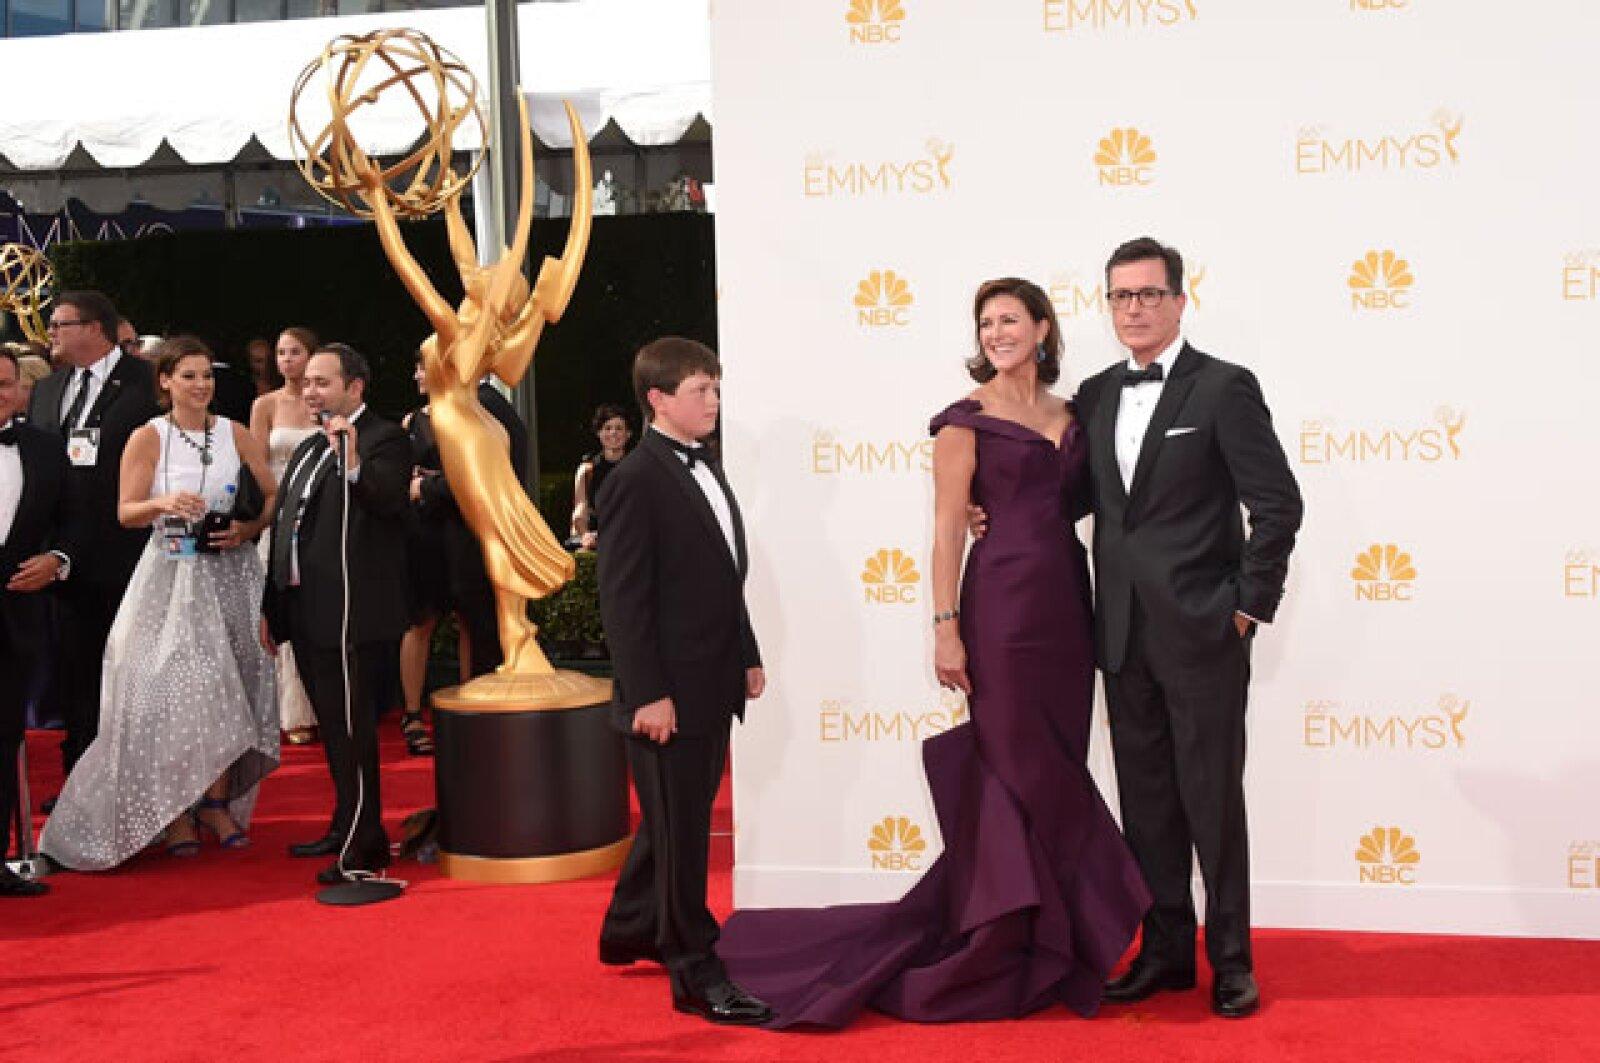 Stephen Colbert, Evelyn McGee-Colbert.